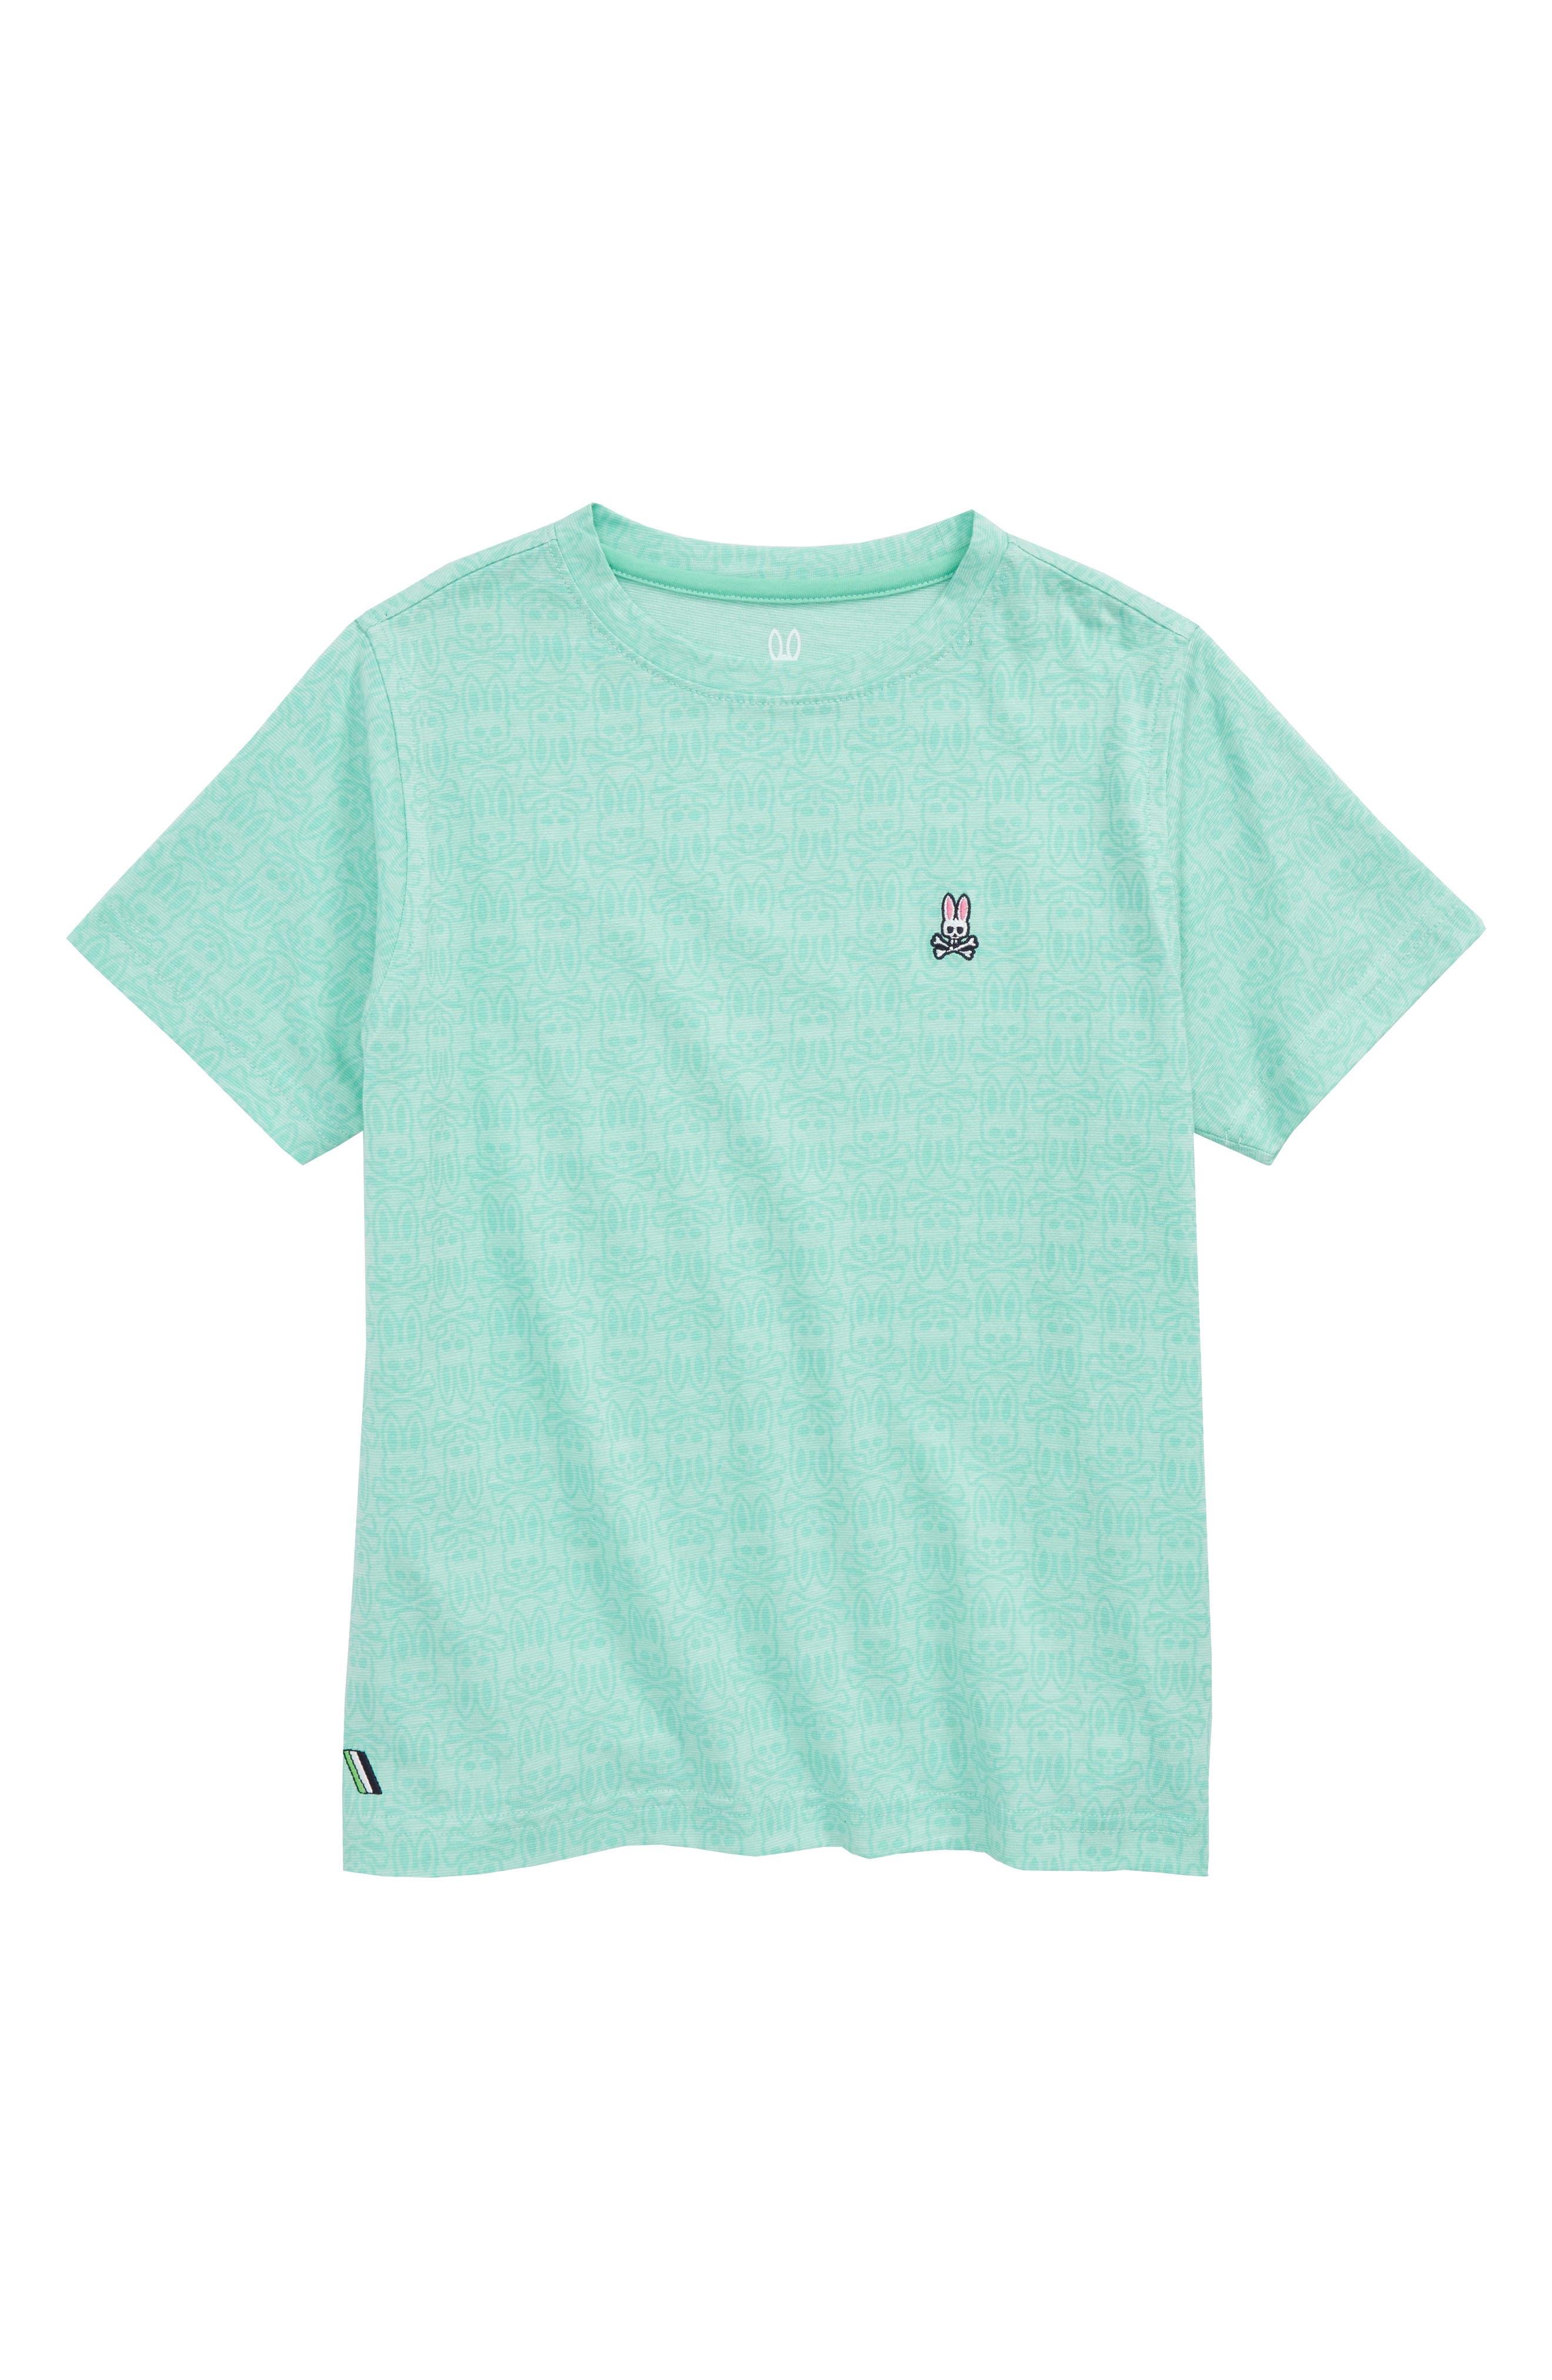 Fareham T-Shirt,                         Main,                         color, Florida